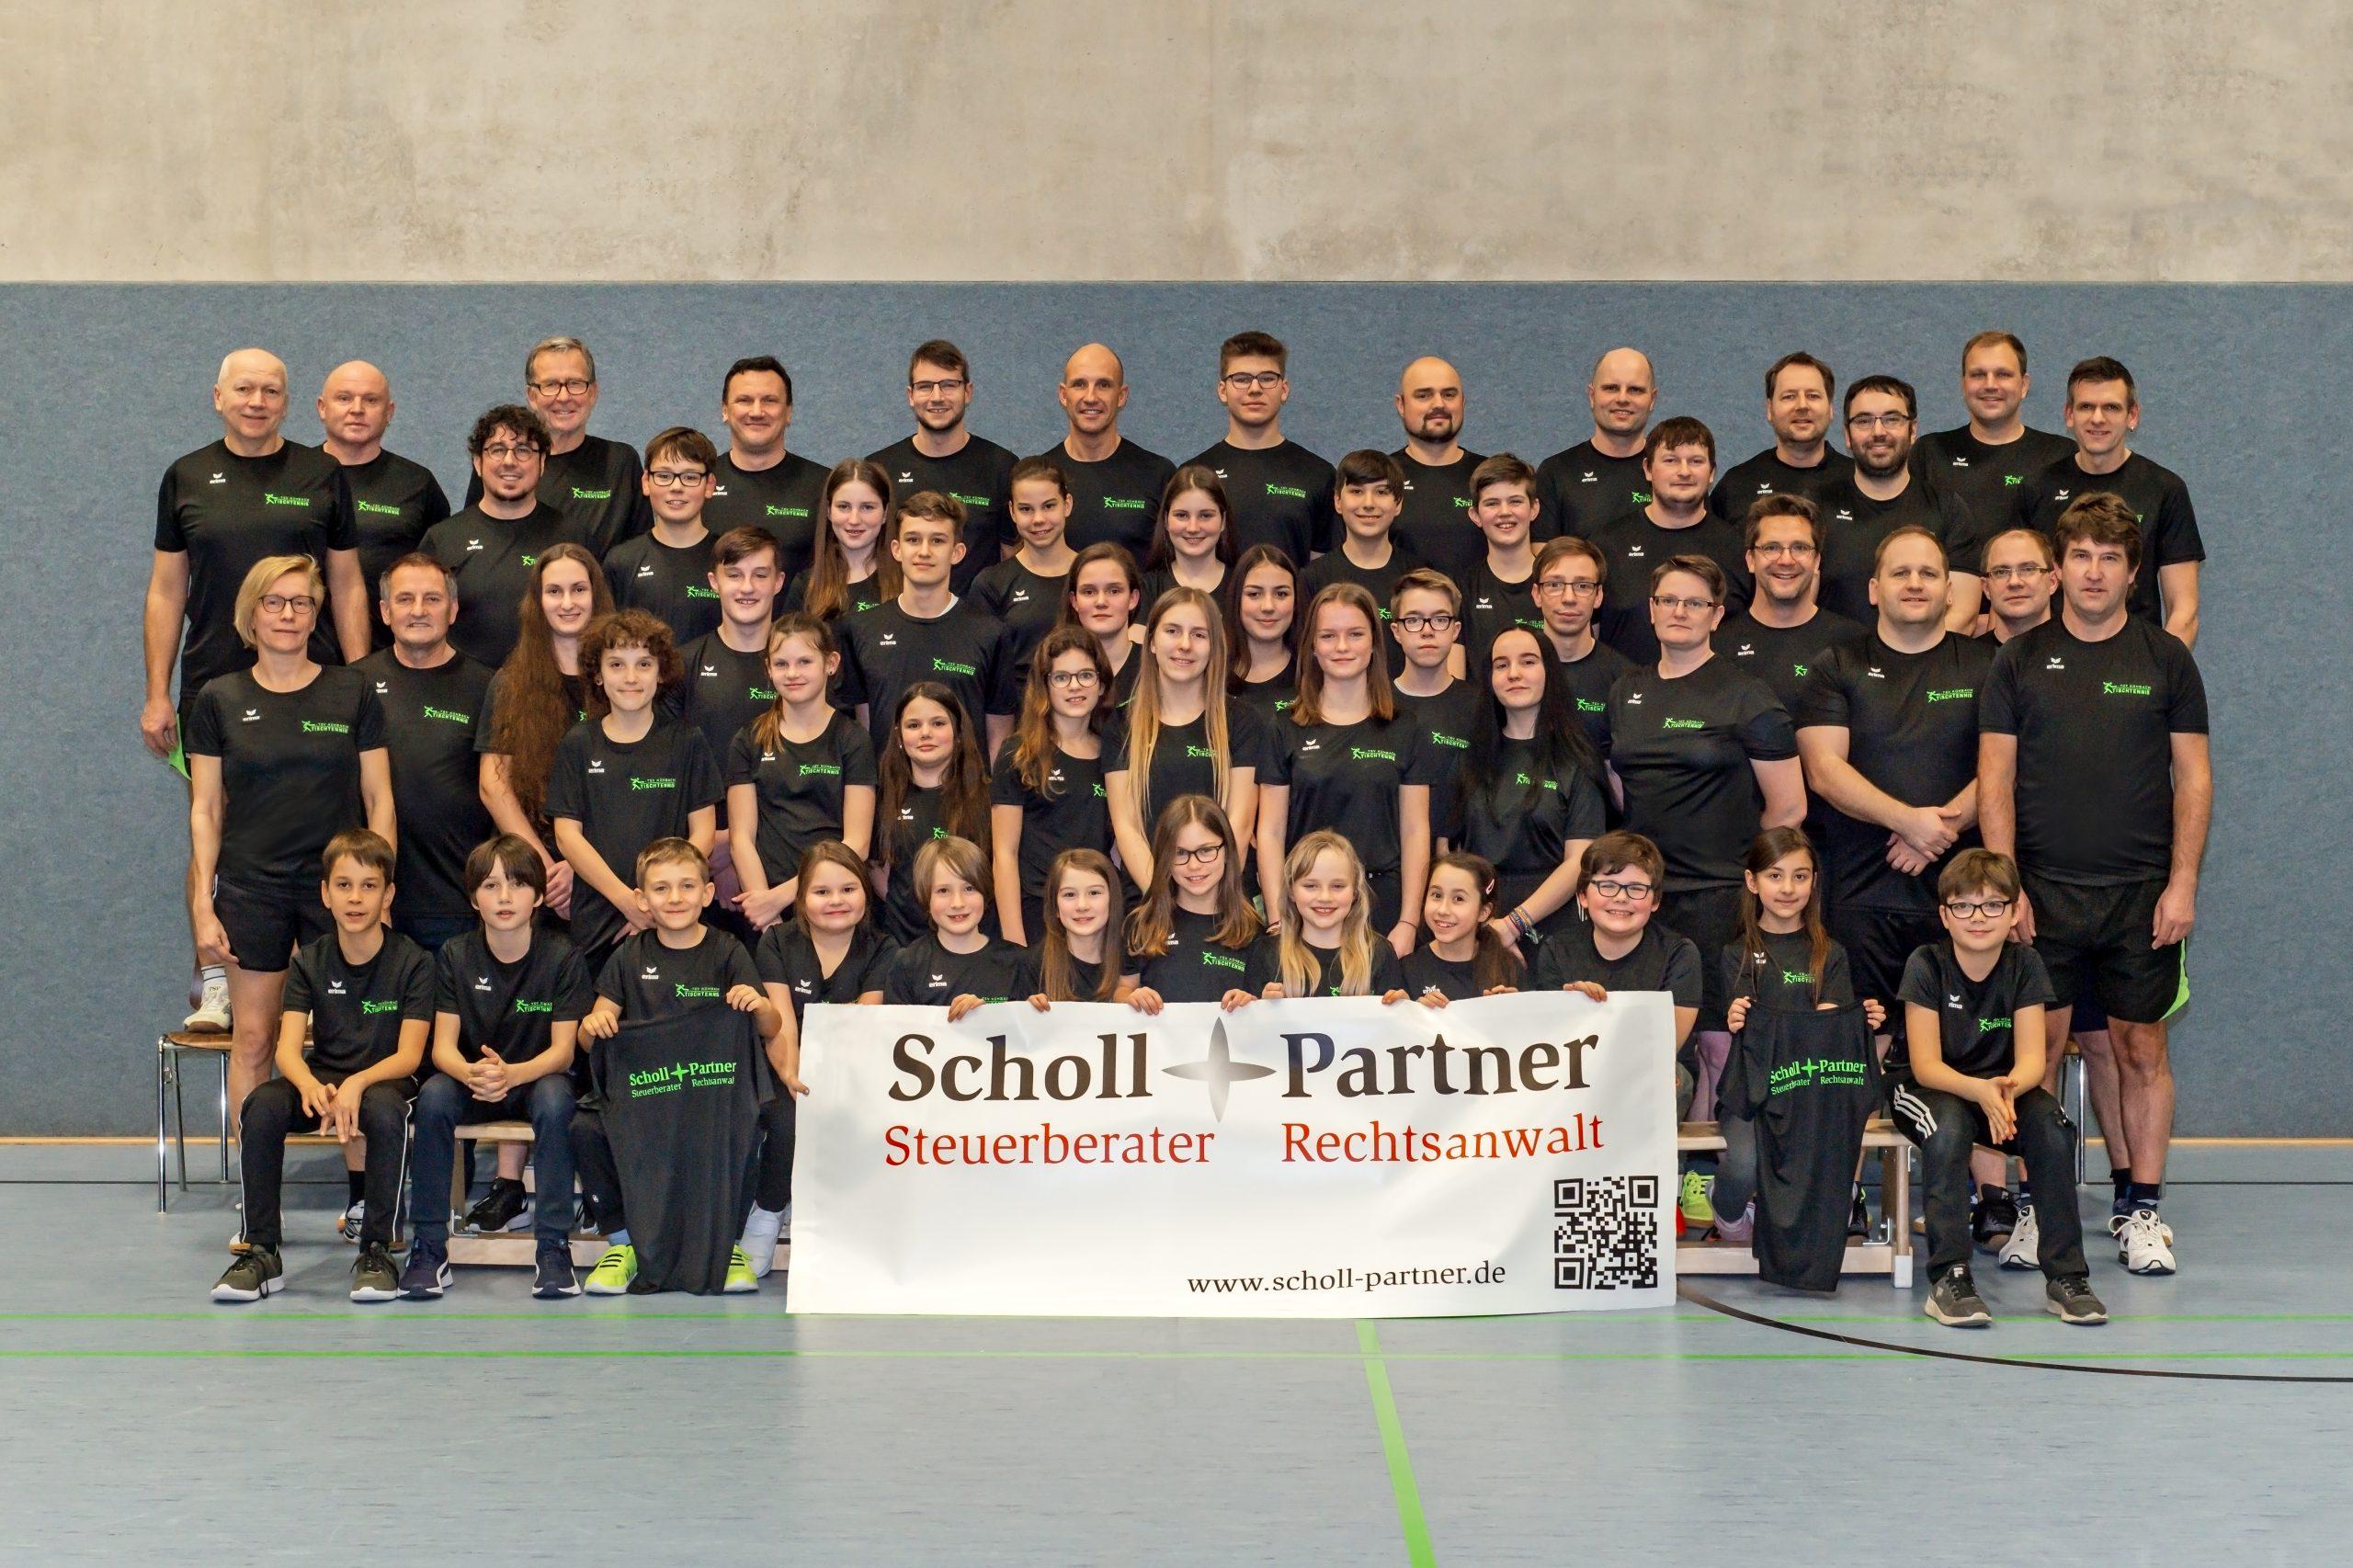 Trainings-Shirts Sponsor Scholl und Partner